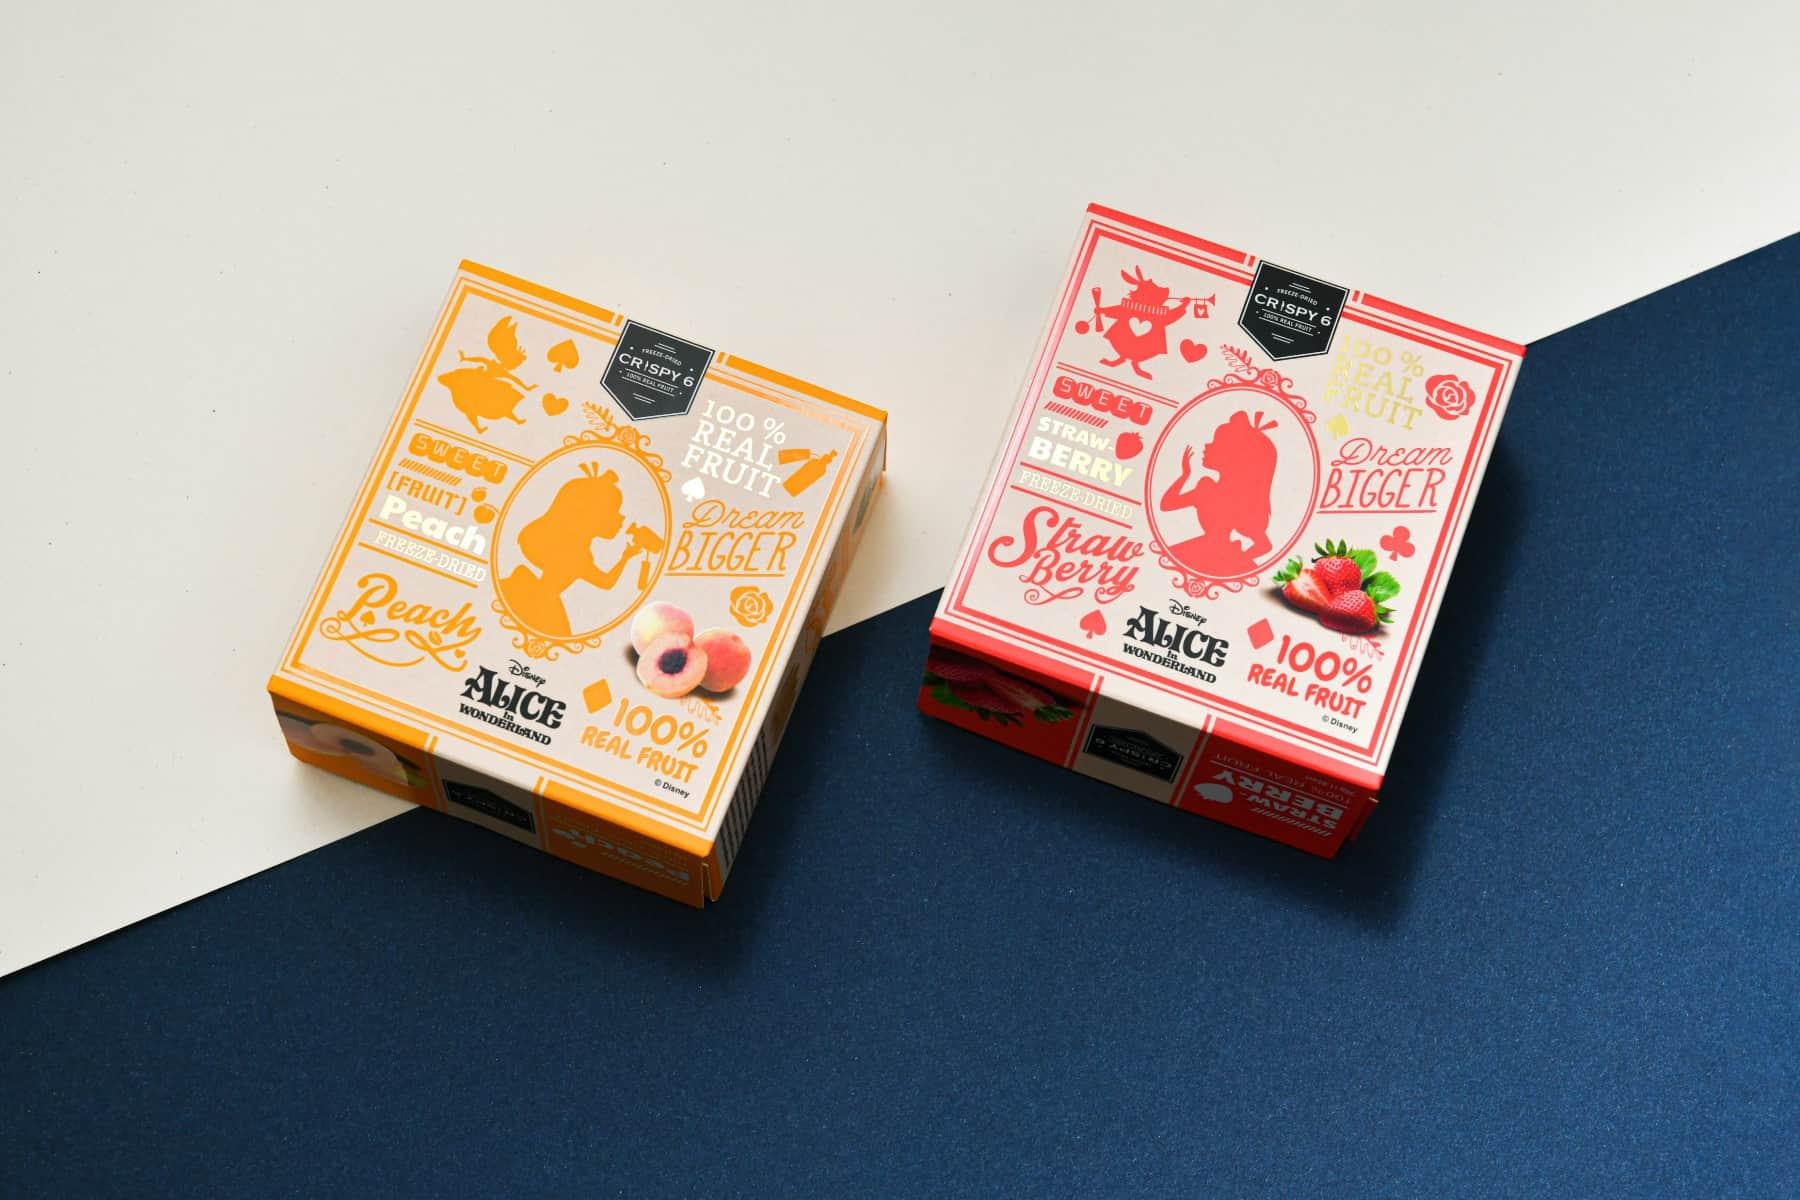 CRISPY 6 Alice in Wonderland Freeze-Dried Fruit Package design